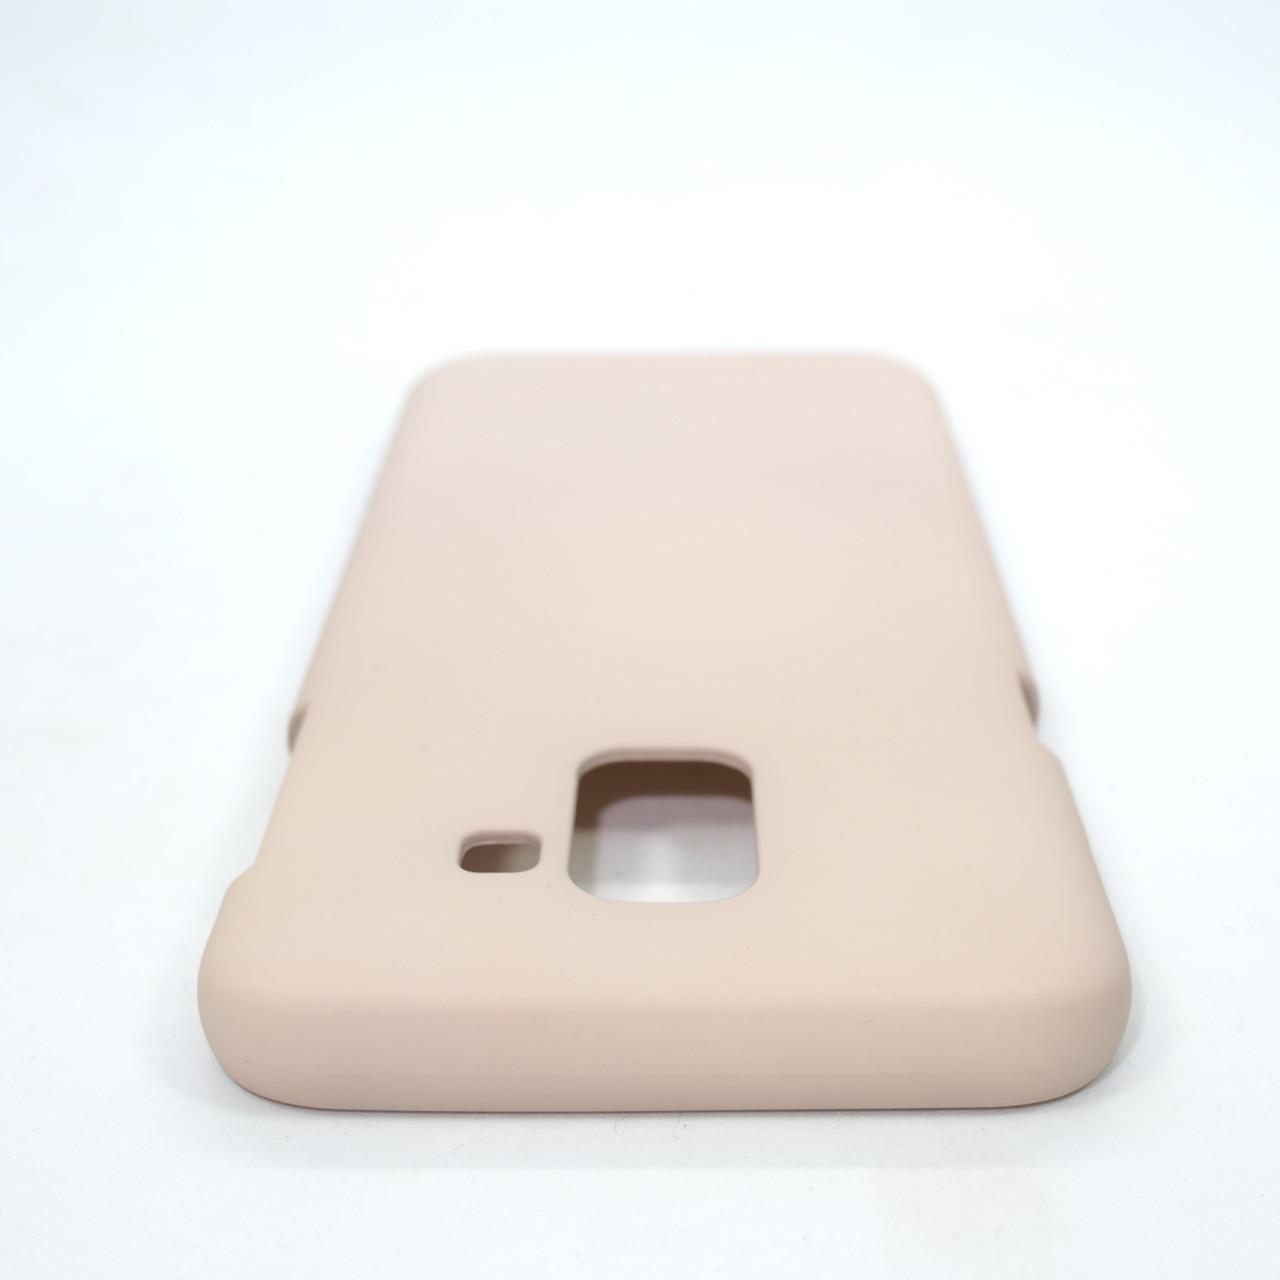 Чехол Goosprey SF Jelly Mercury Samsung Galaxy J6 J600 pink sand (J600) 2018 Для телефона